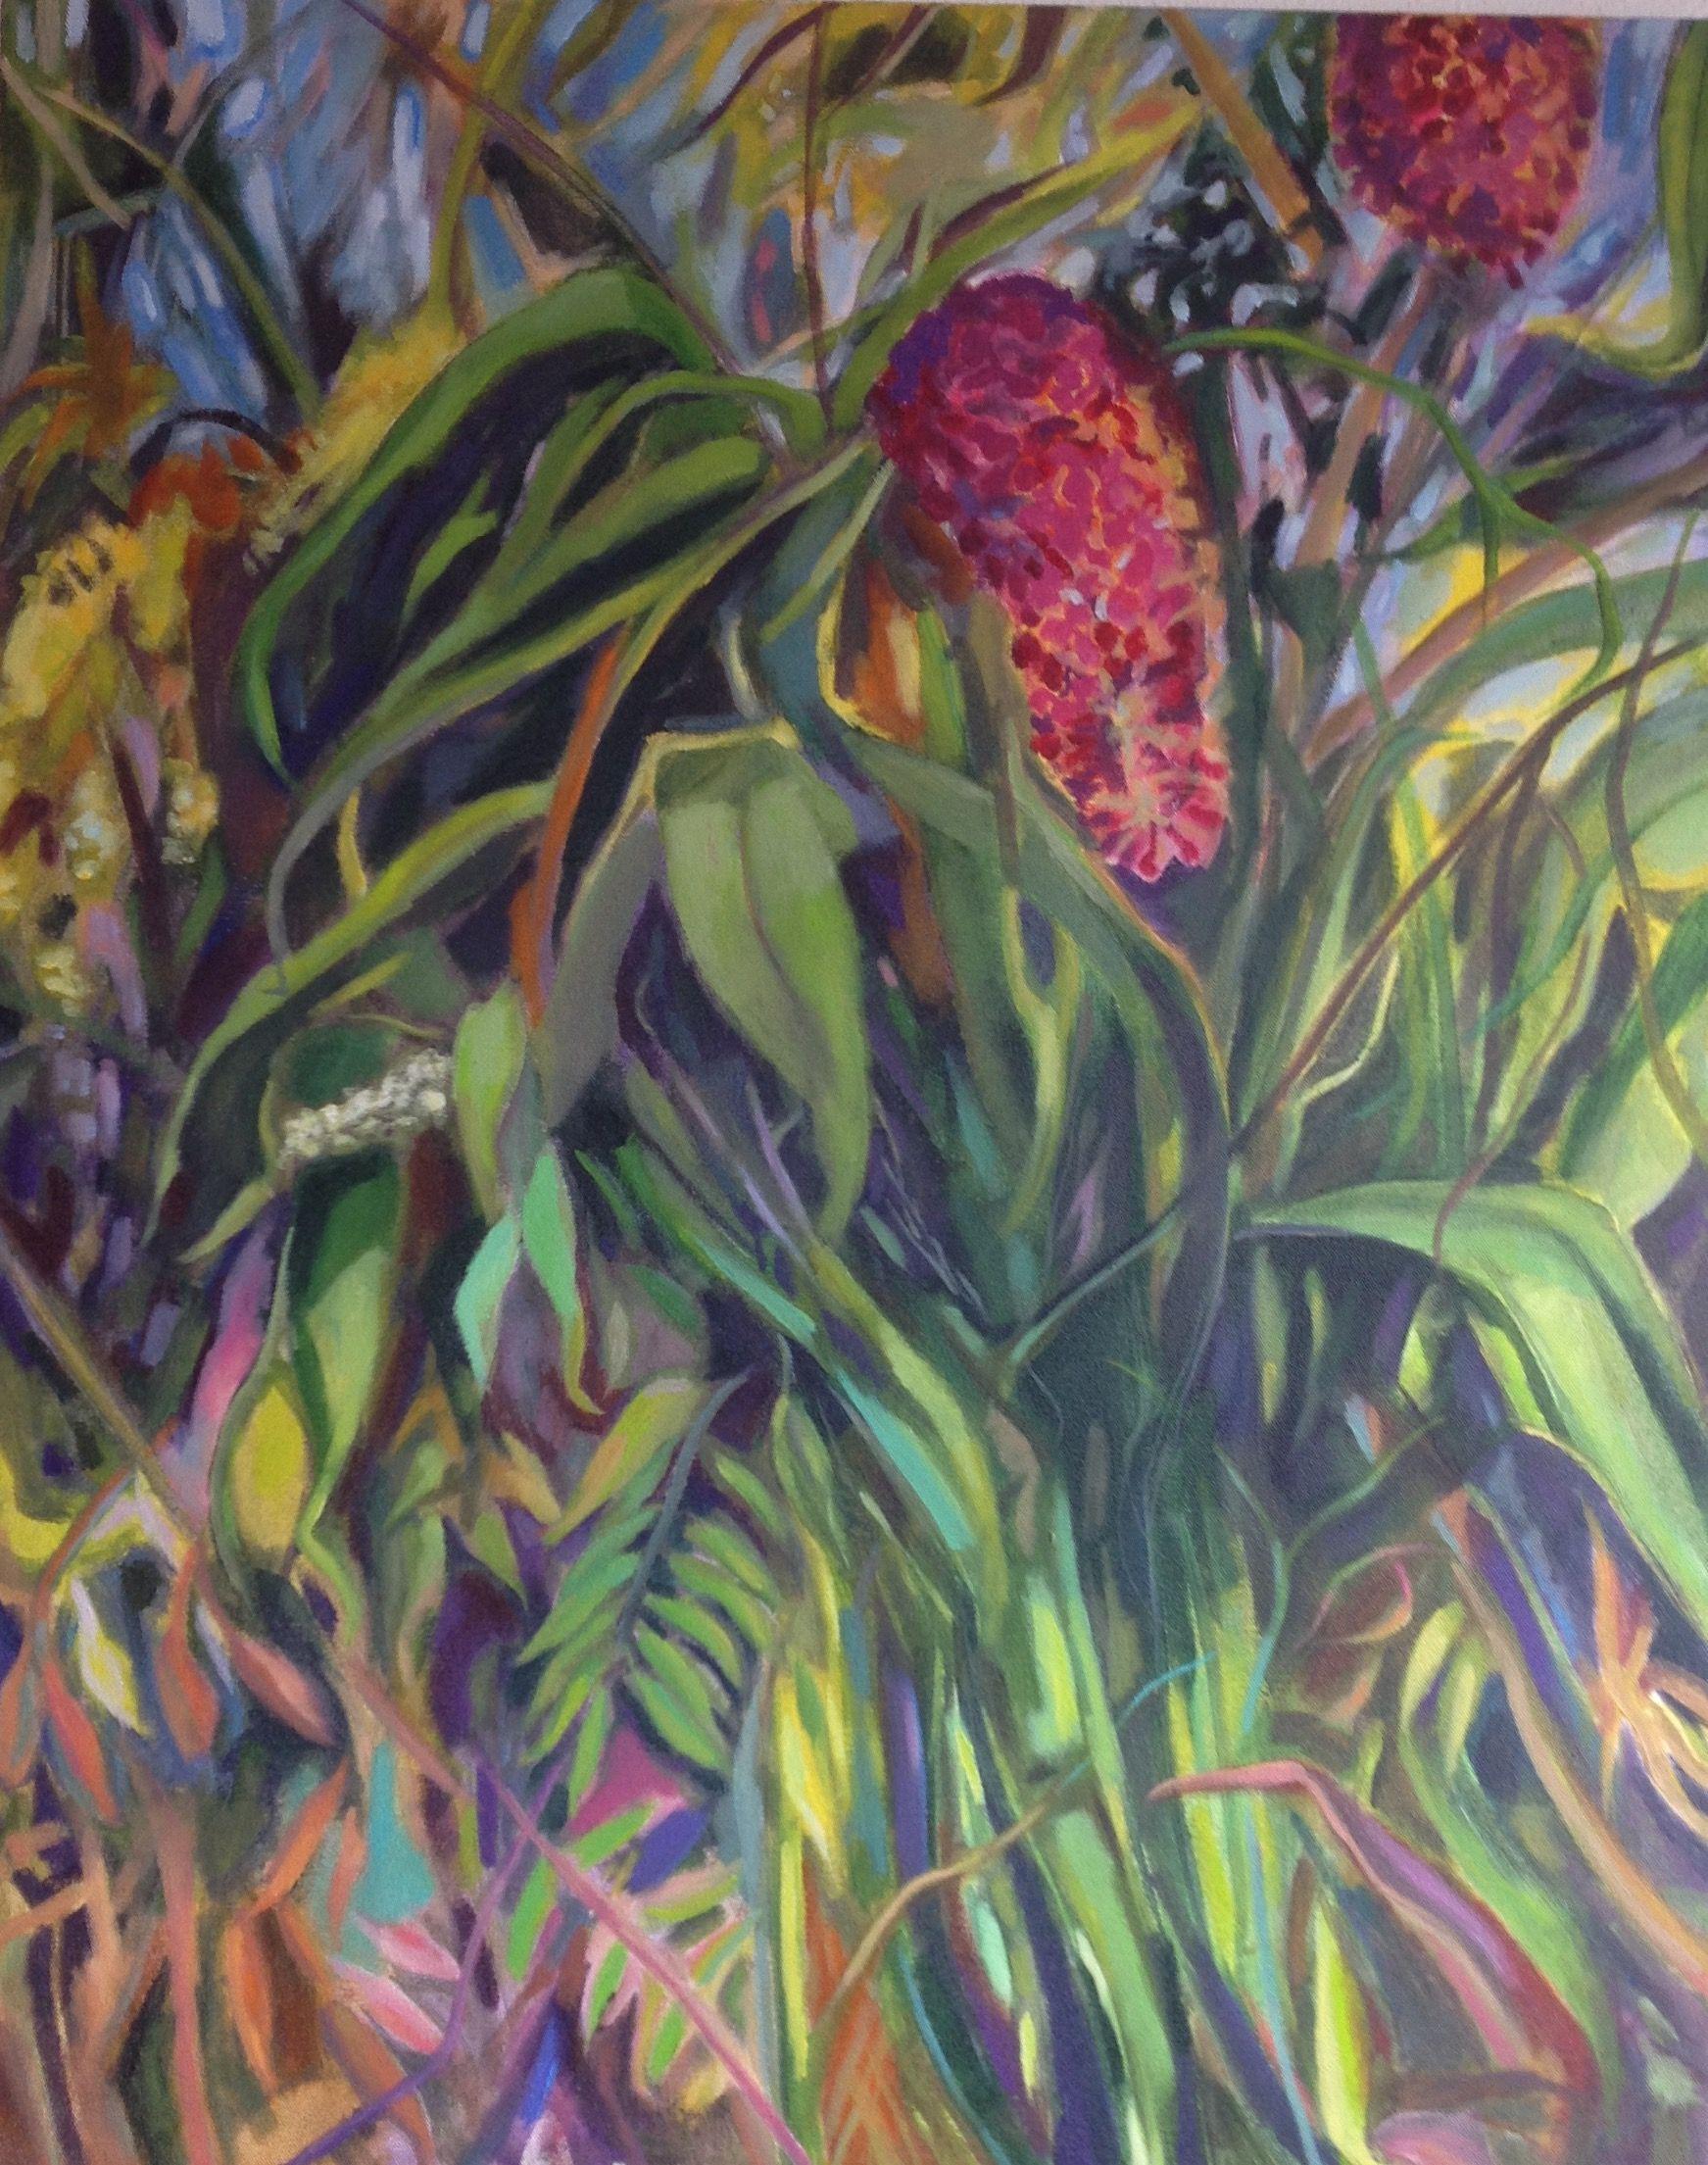 Lush, Painting, Acrylic on Canvas